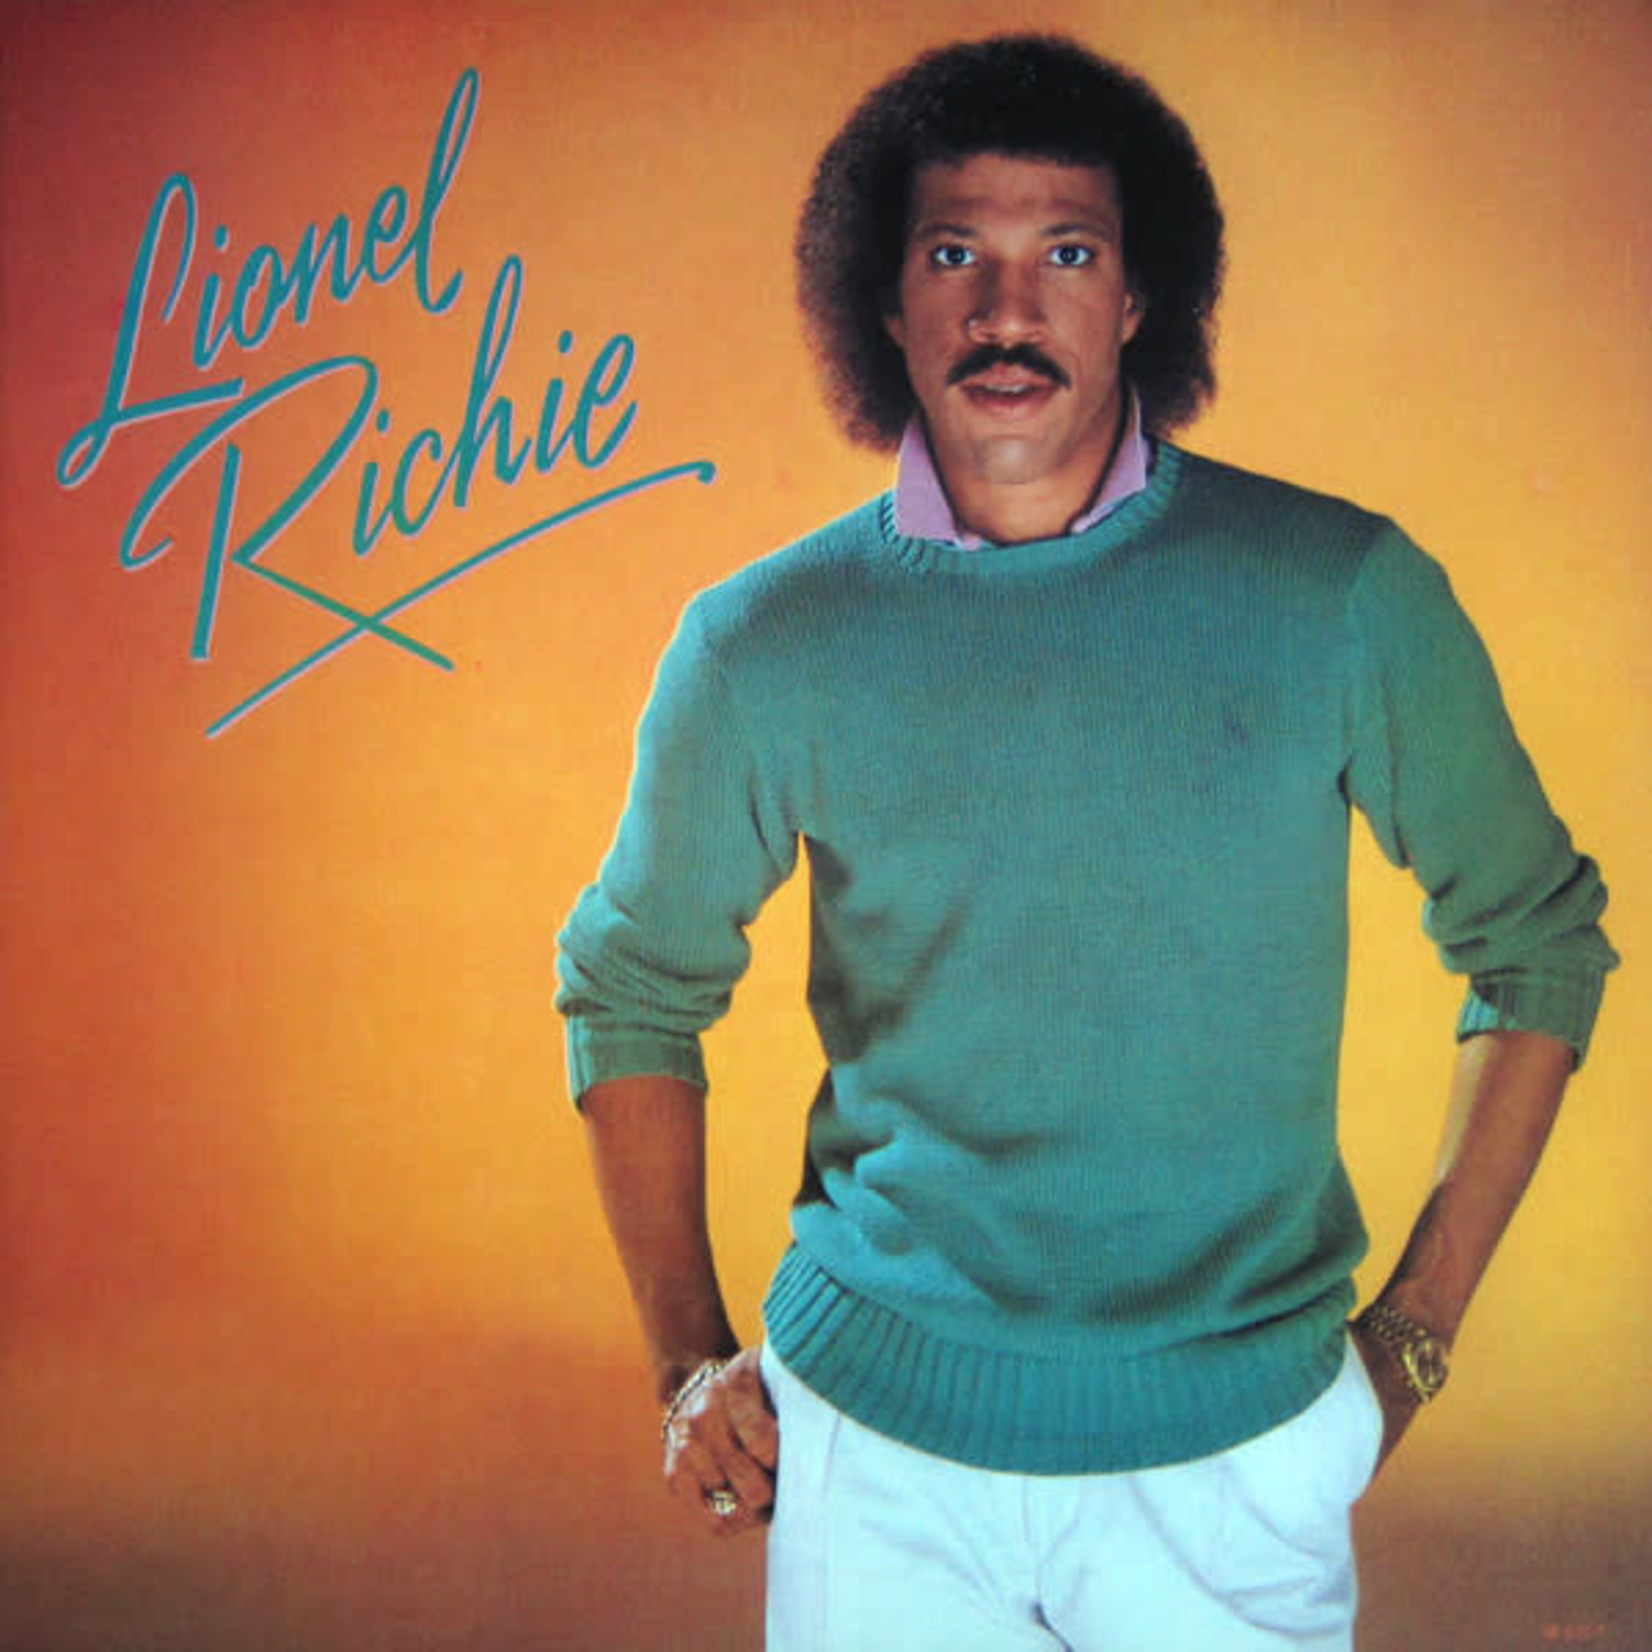 [Vintage] Richie, Lionel: self-titled